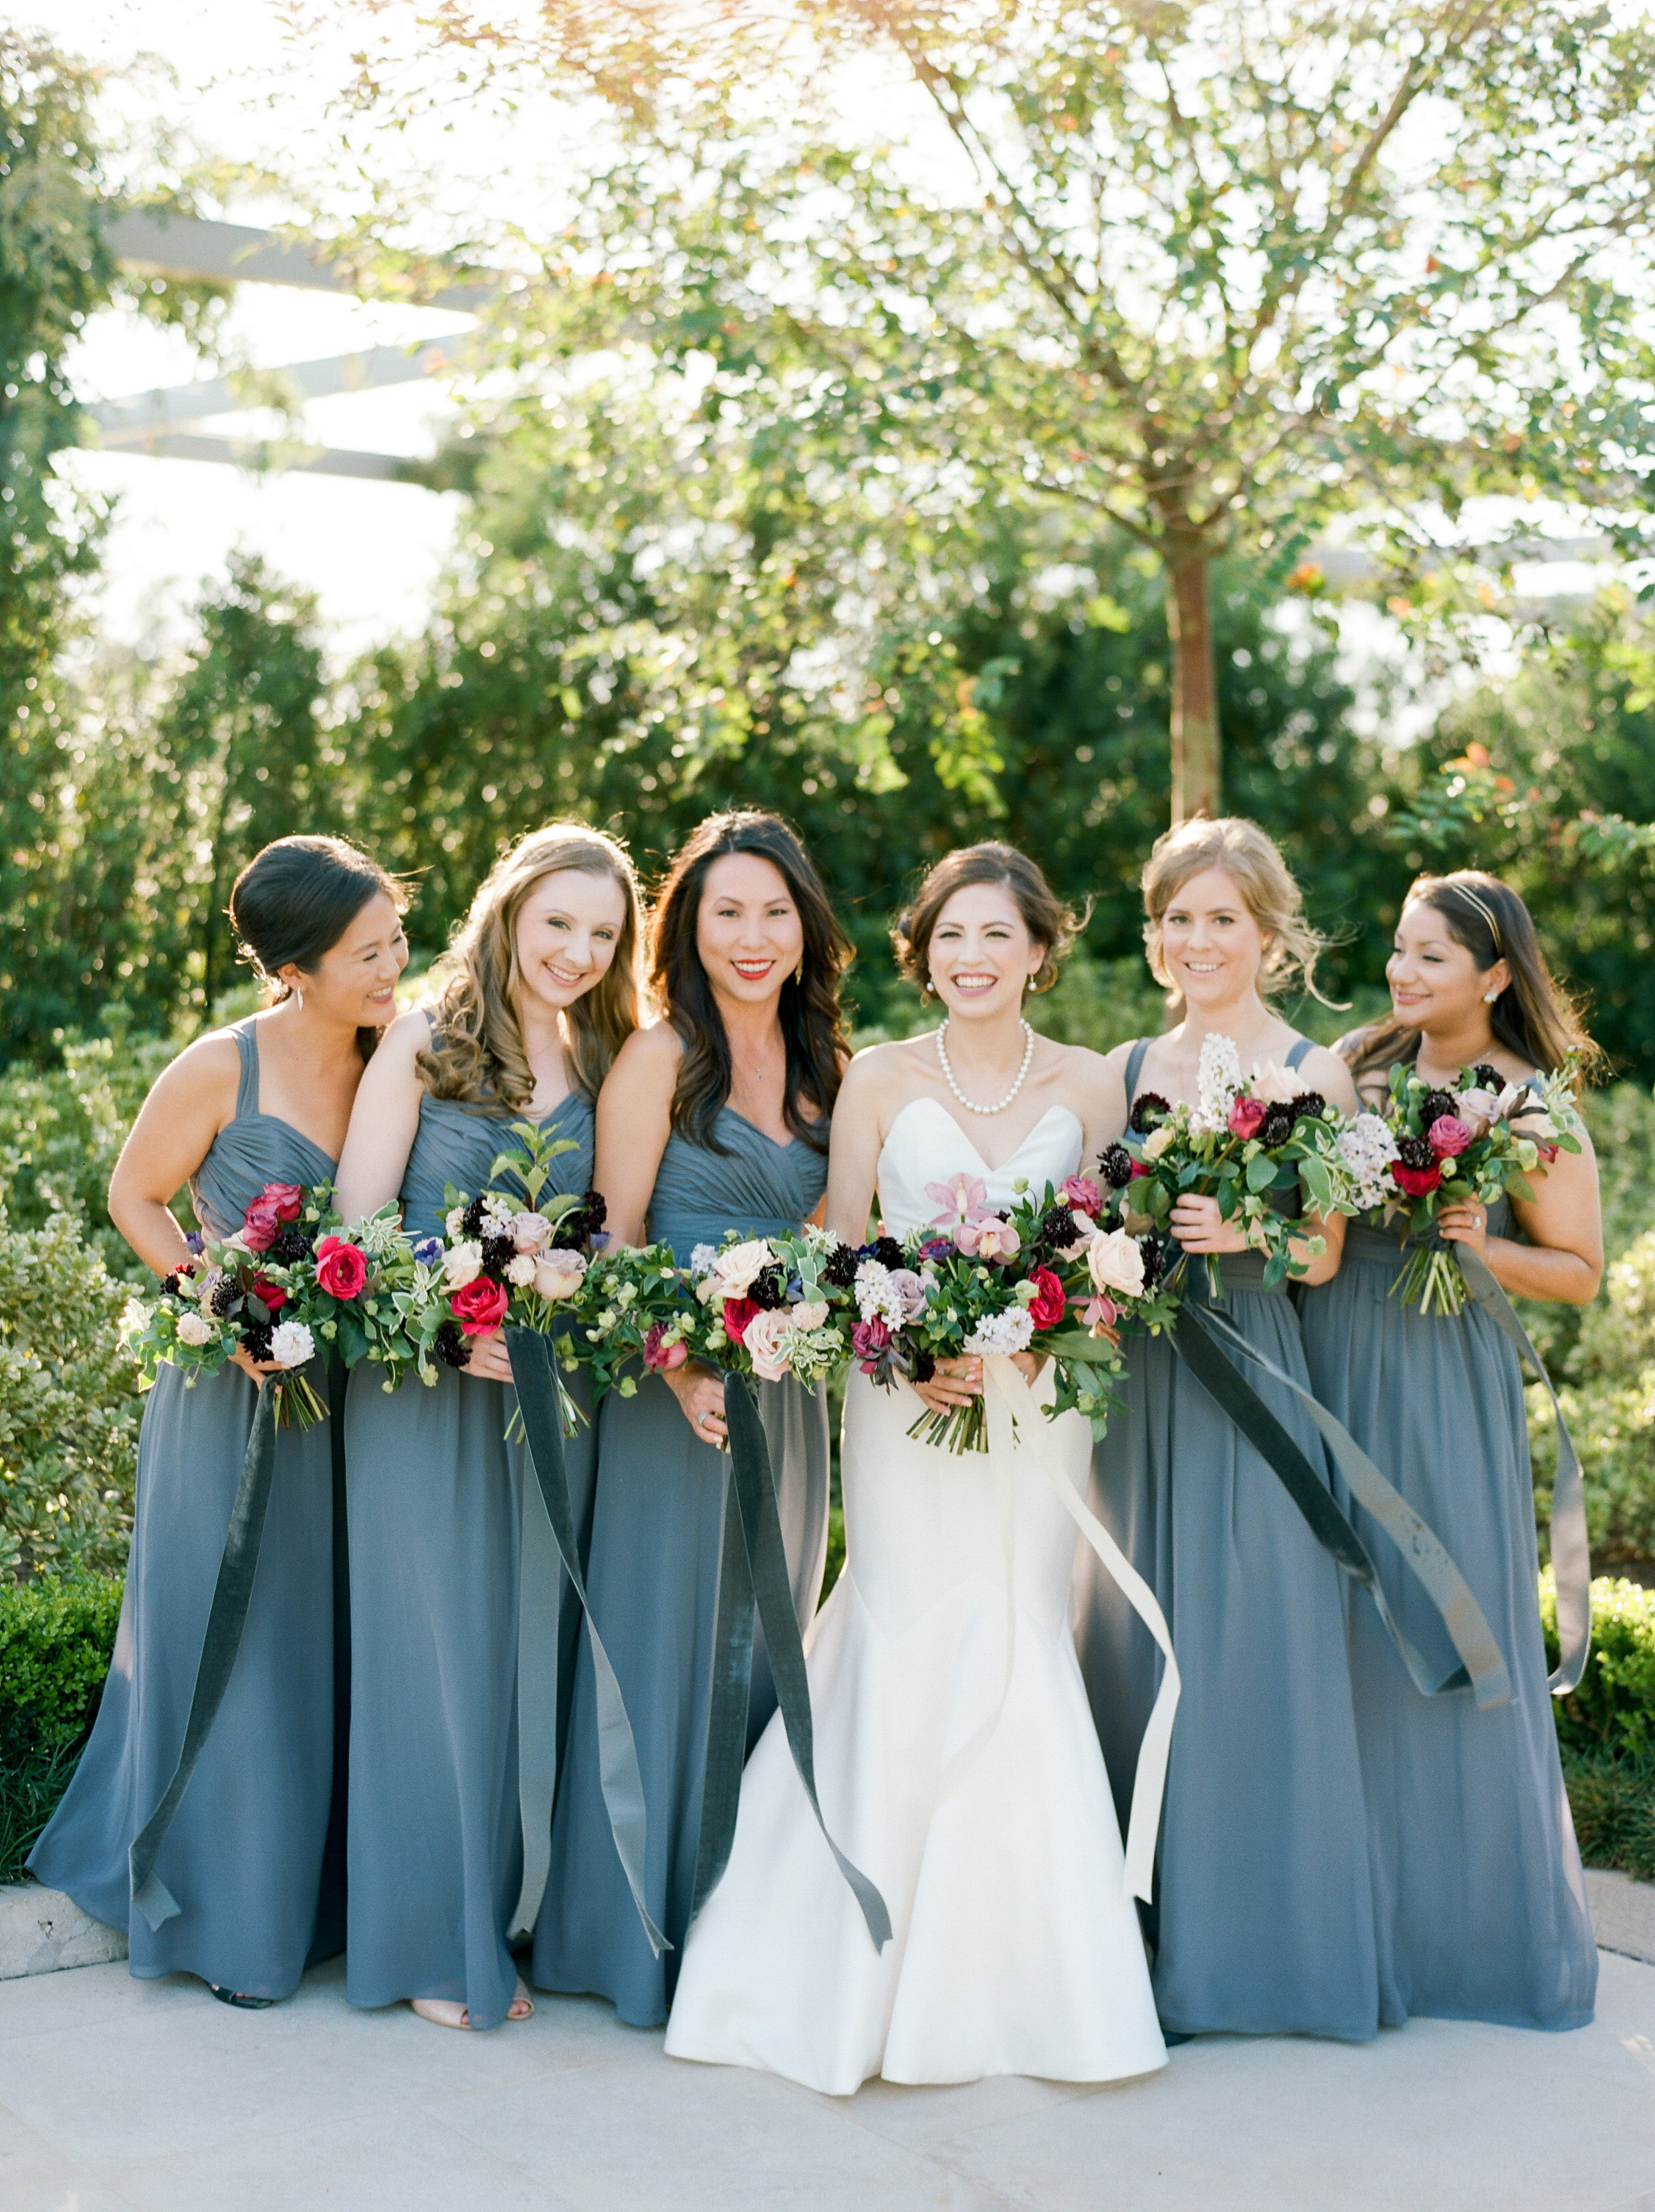 The-Knot-Texas-Magazine-Wedding-Top-Best-Houston-Wedding-Photographer-Fine-Art-Film-Dana-Fernandez-Photography-111.jpg